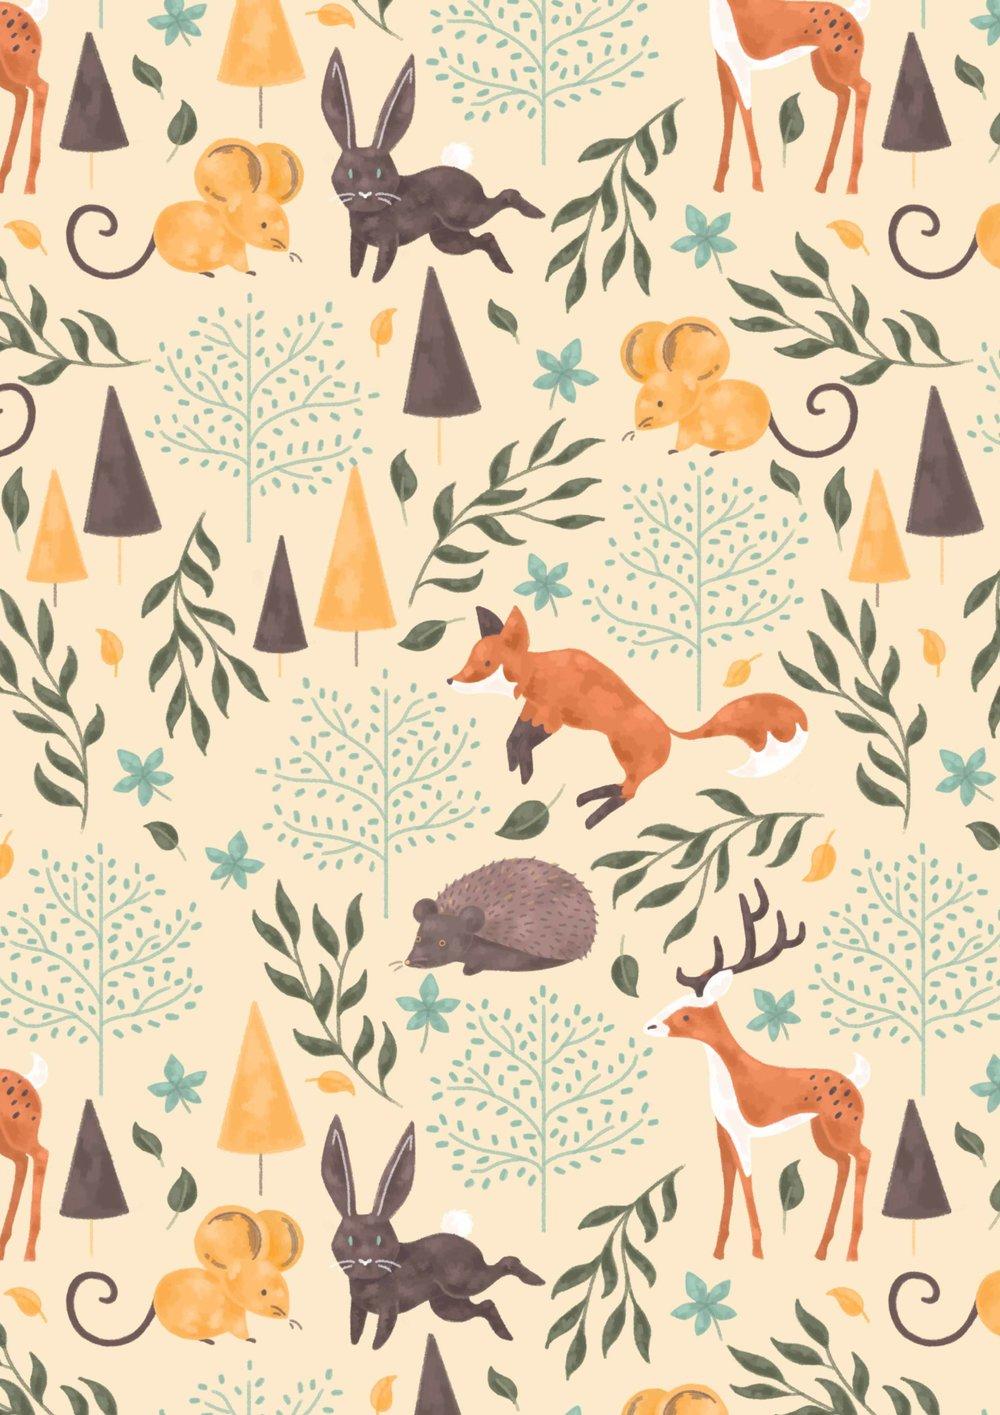 Illustrated pattern, woodland animals, fox, rabbits, deer, mouse, hedgehog.